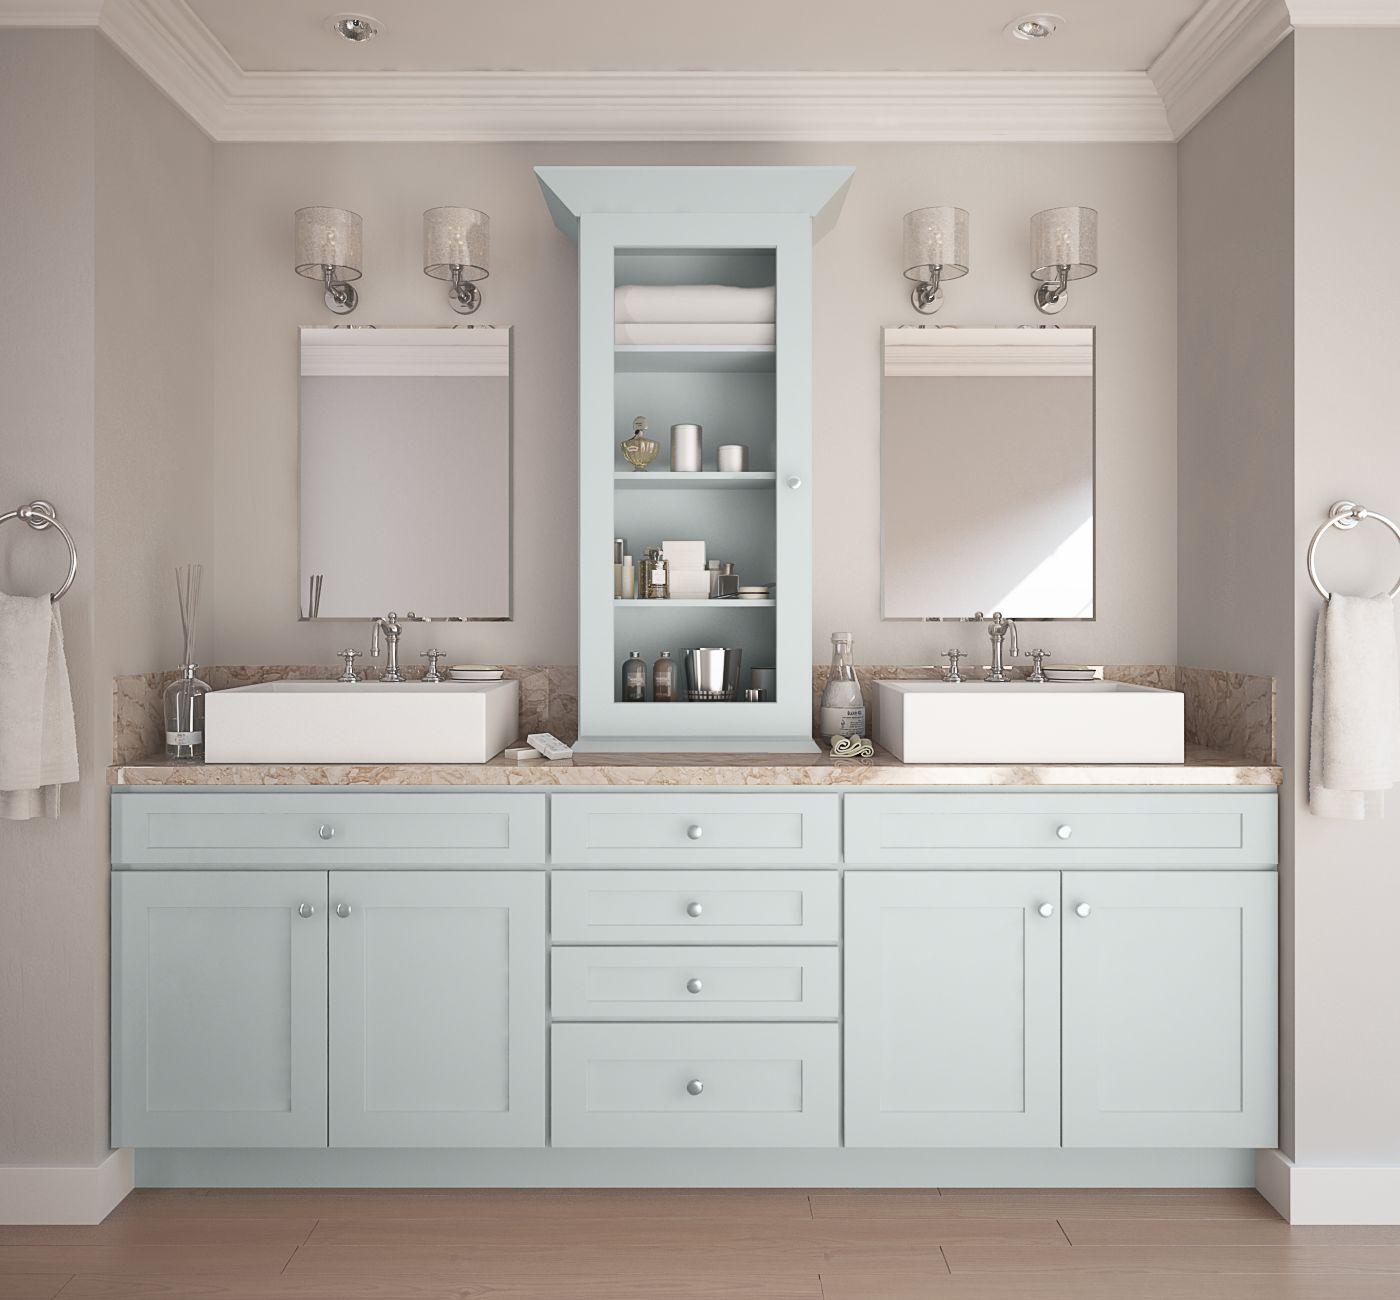 Already Assembled Kitchen Cabinets: Society Shaker Tidewater (Semi-Custom)